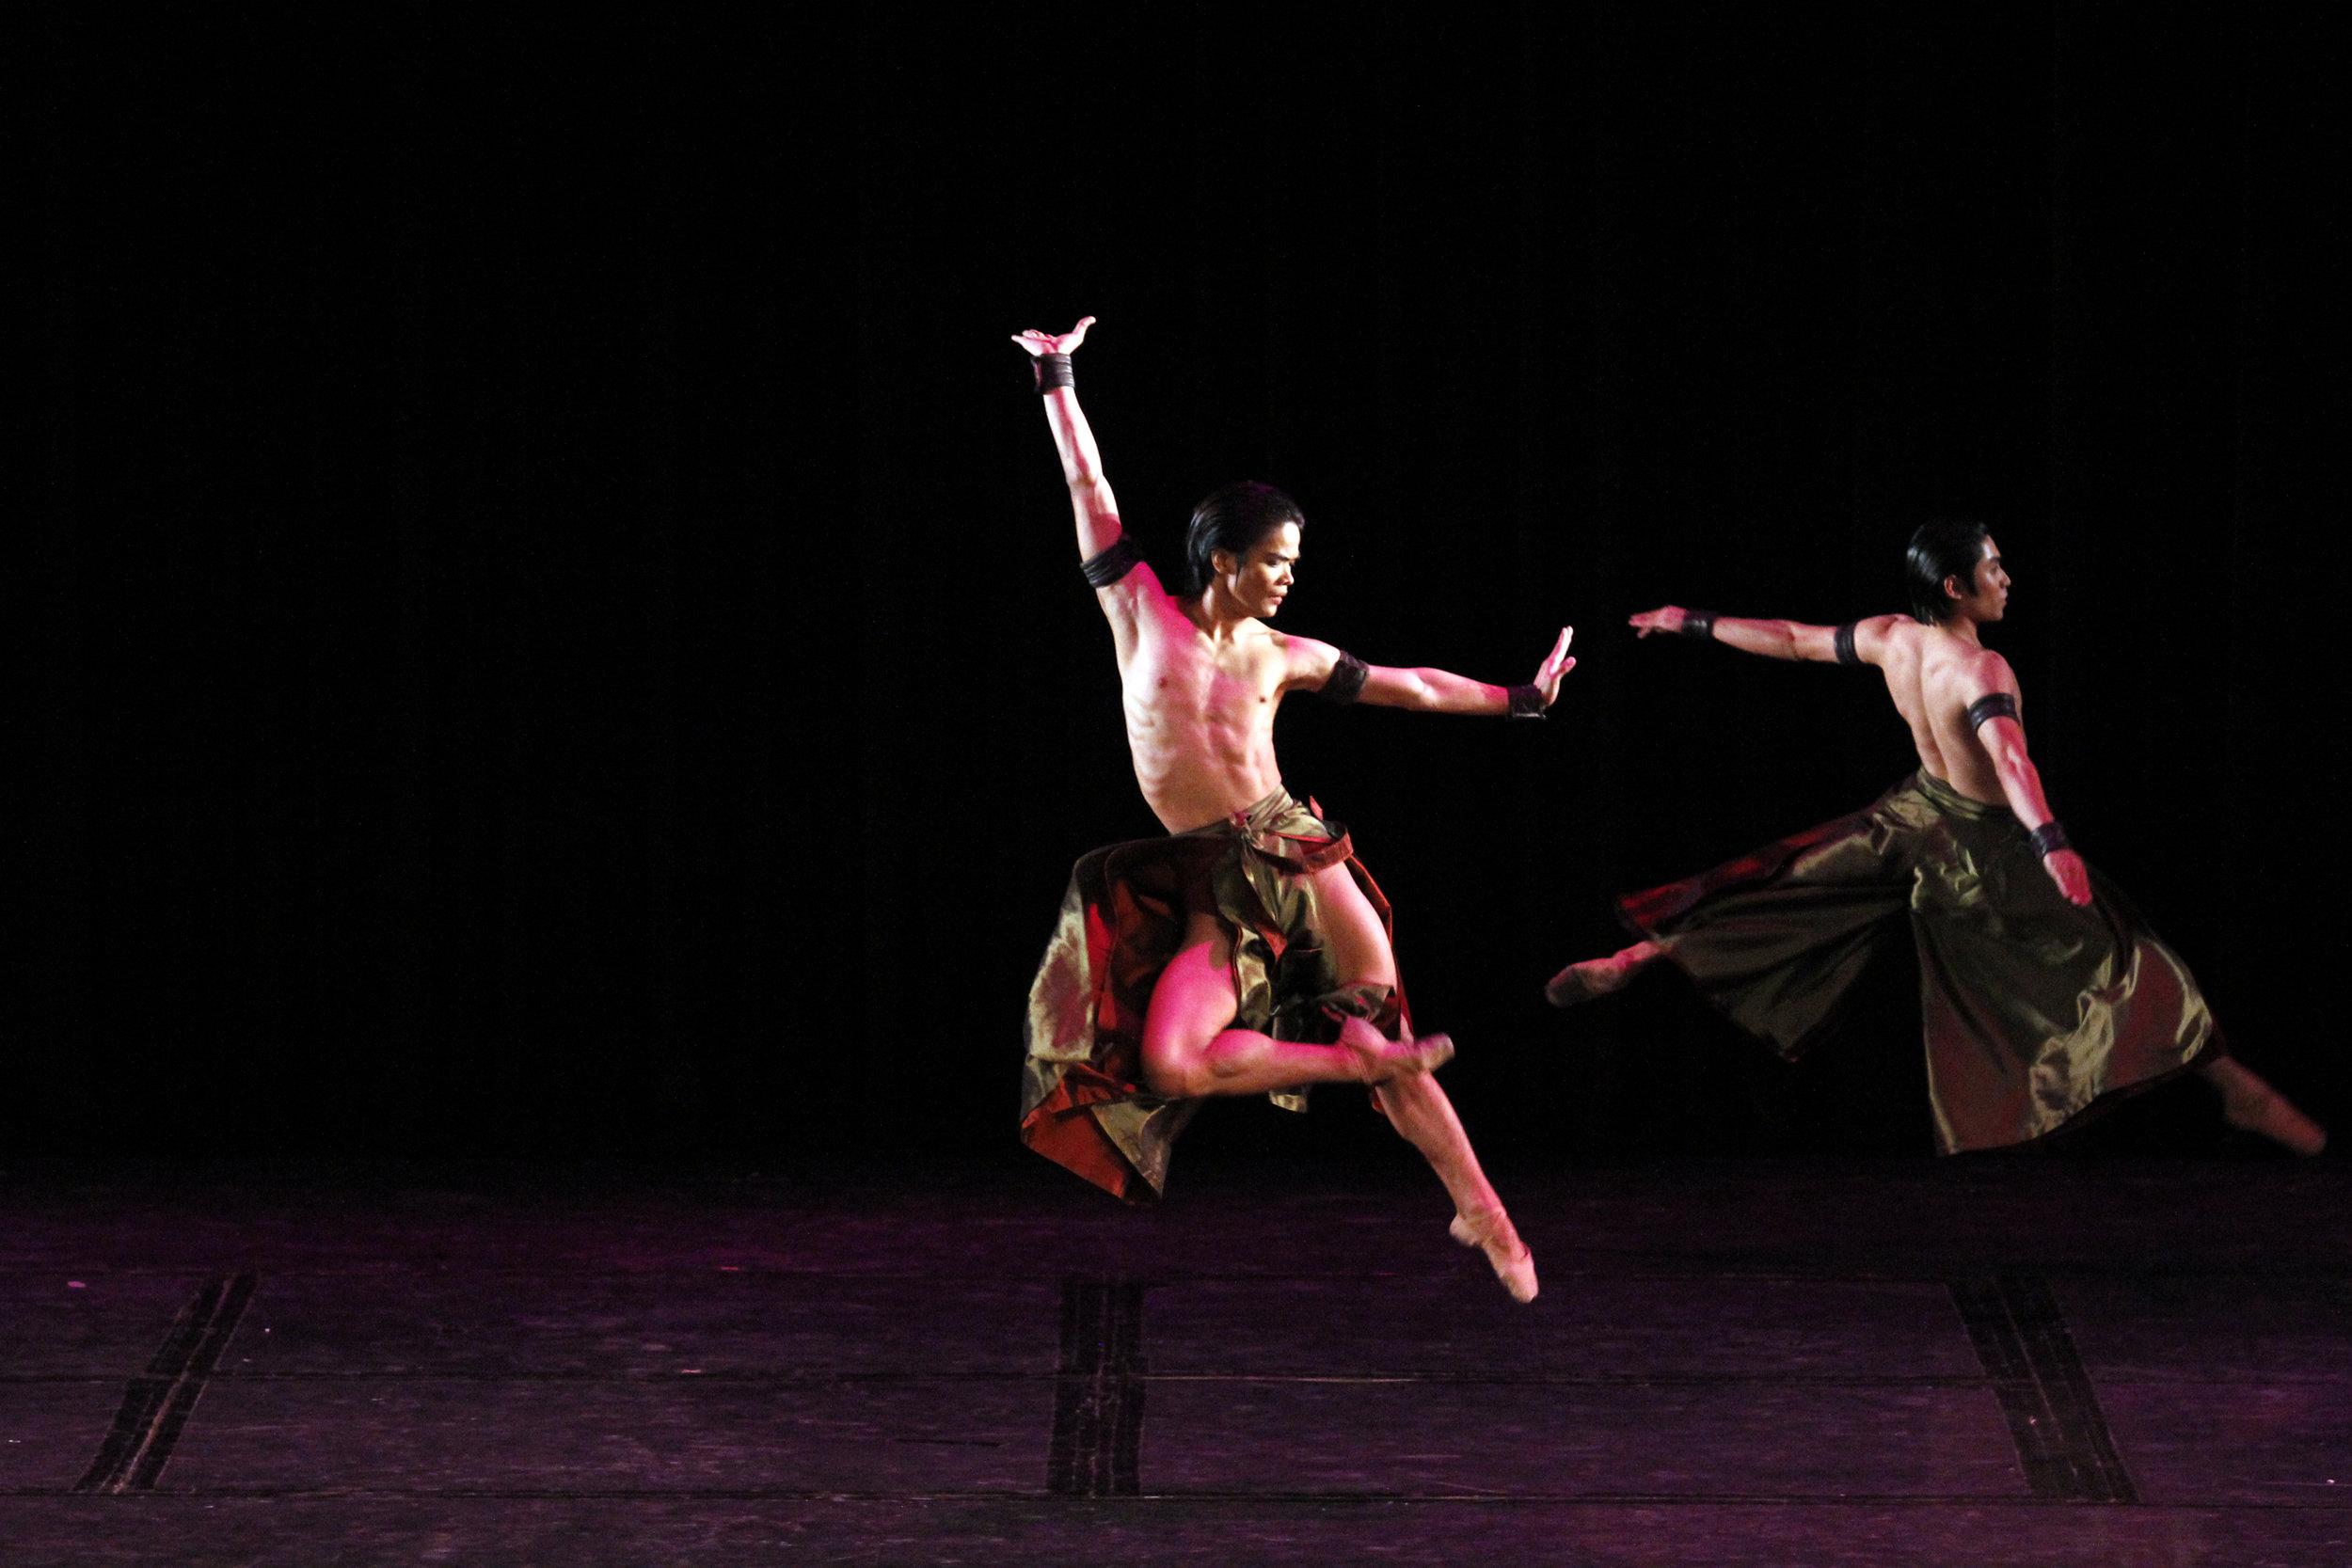 Elpidio Magat makes a leap in Bam Damian's    Reconfigured   , presented in    Ballet & Ballads    (2013). Photo by Ocs Alvarez